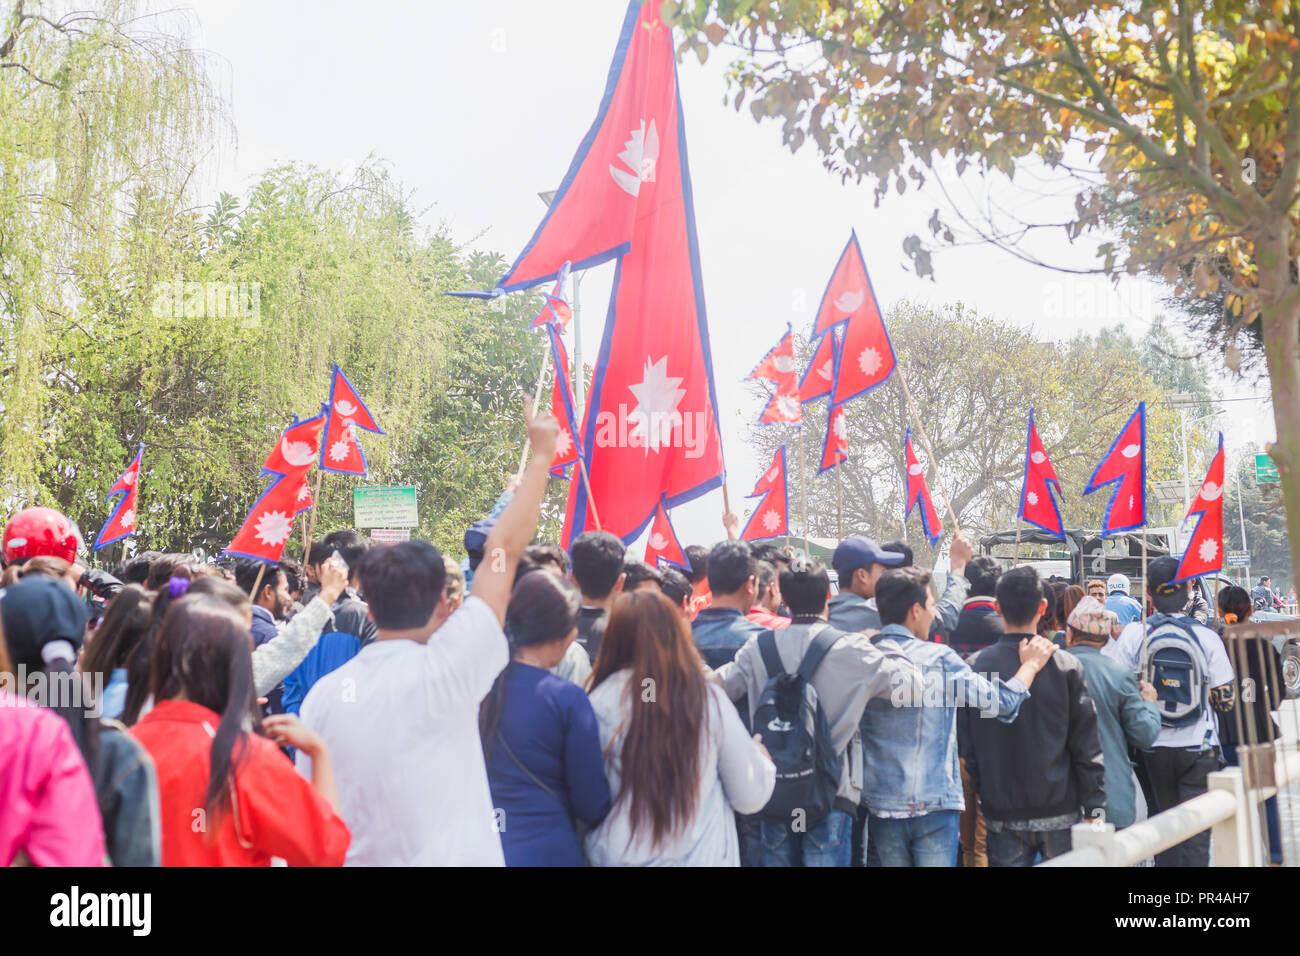 Kathmandu, Nepal - Mar 10,2018: Menschen bei Rallye mit nepalesischen Flaggen in Kathmandu. Demonstranten Stockbild